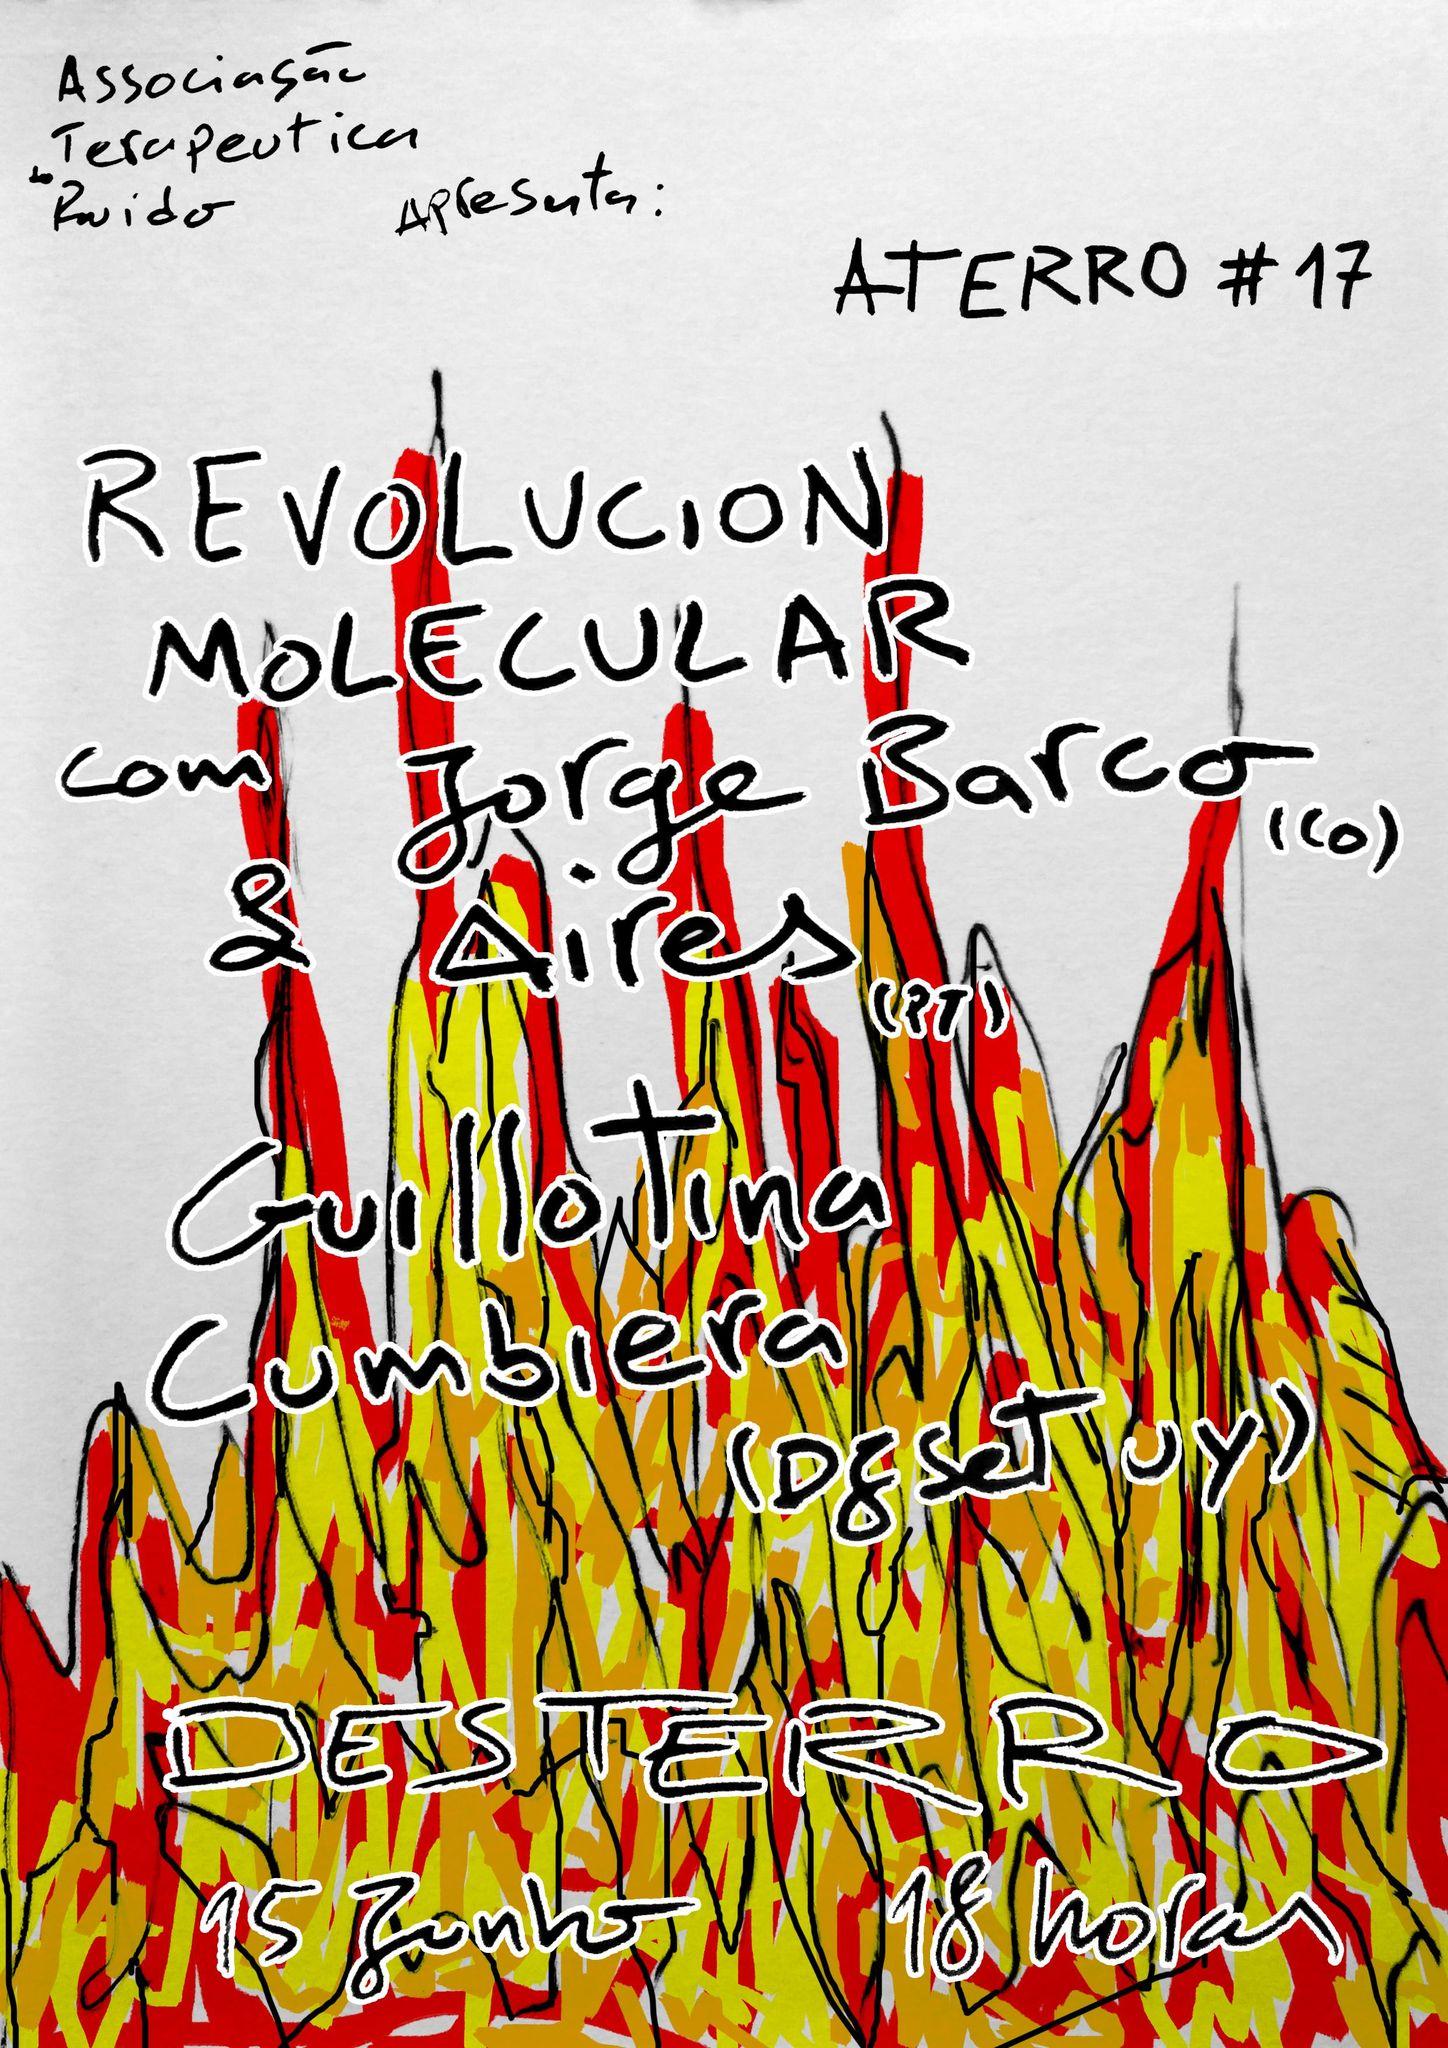 Aterro #17: Jorge Barco & Aires + Guillotina Cumbiera